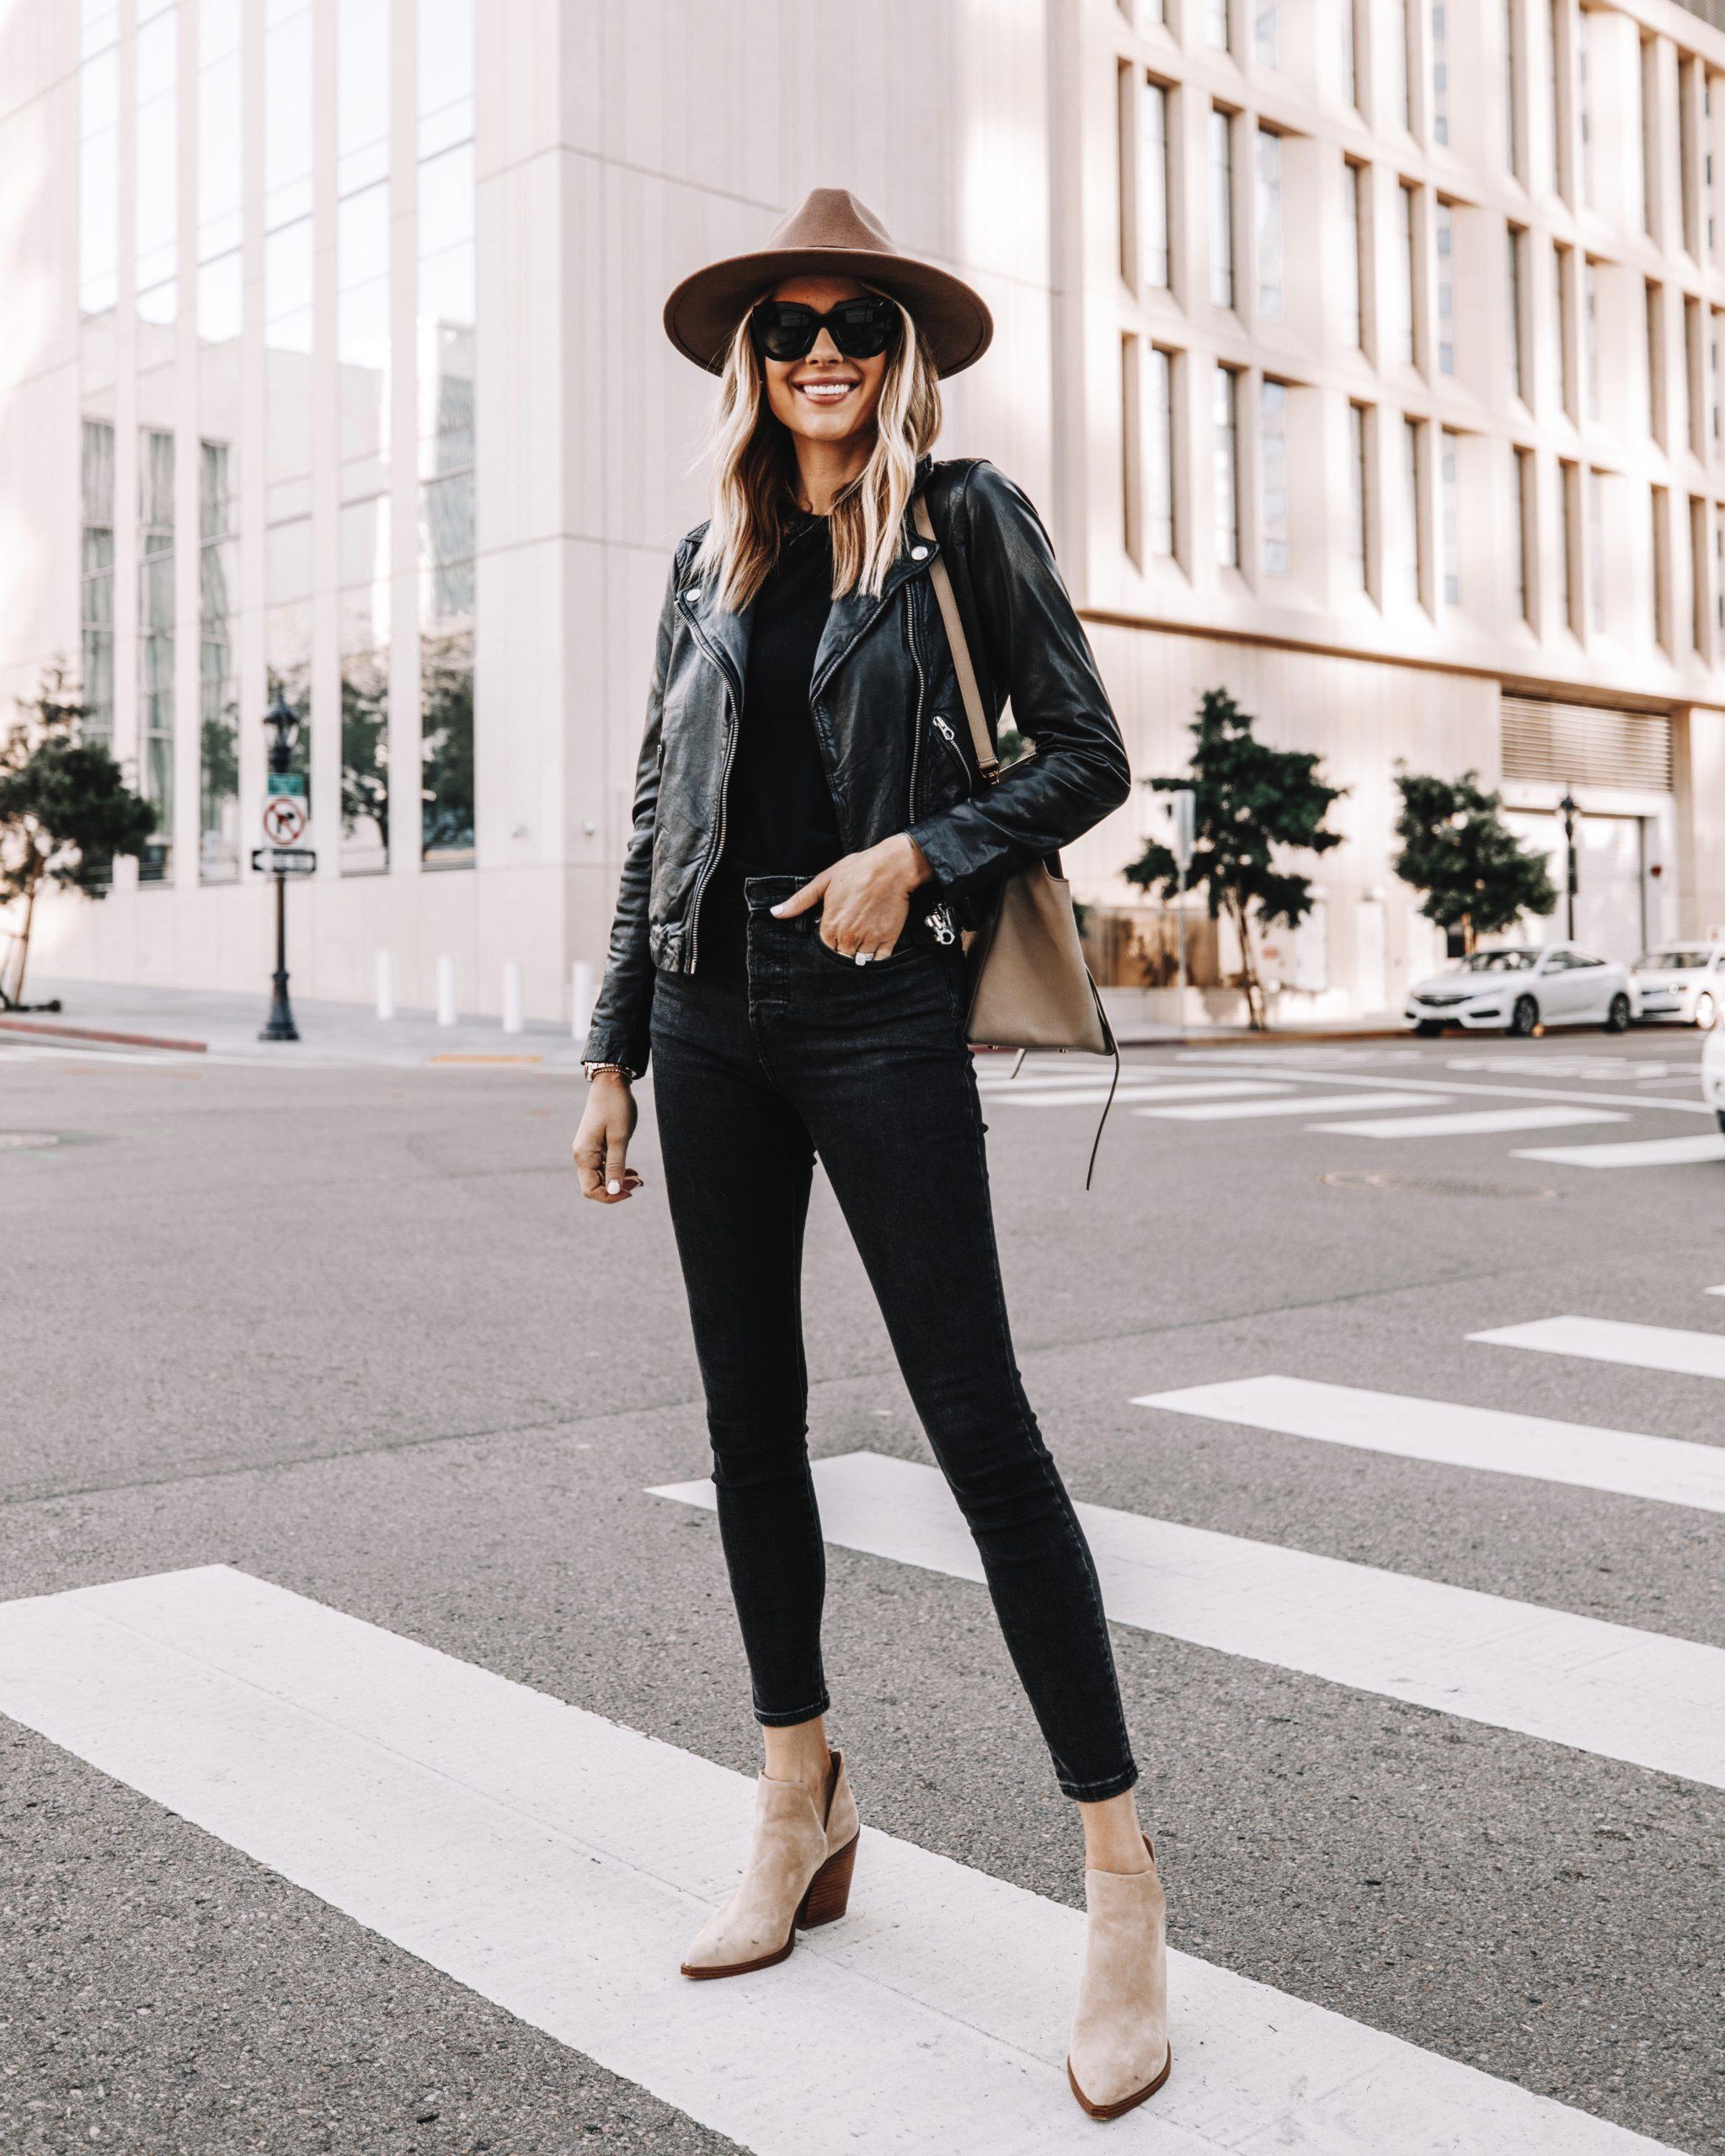 Fashion Jackson Black Leather Jacket Black Skinny Jeans Tan Suede Booties Tan Hat